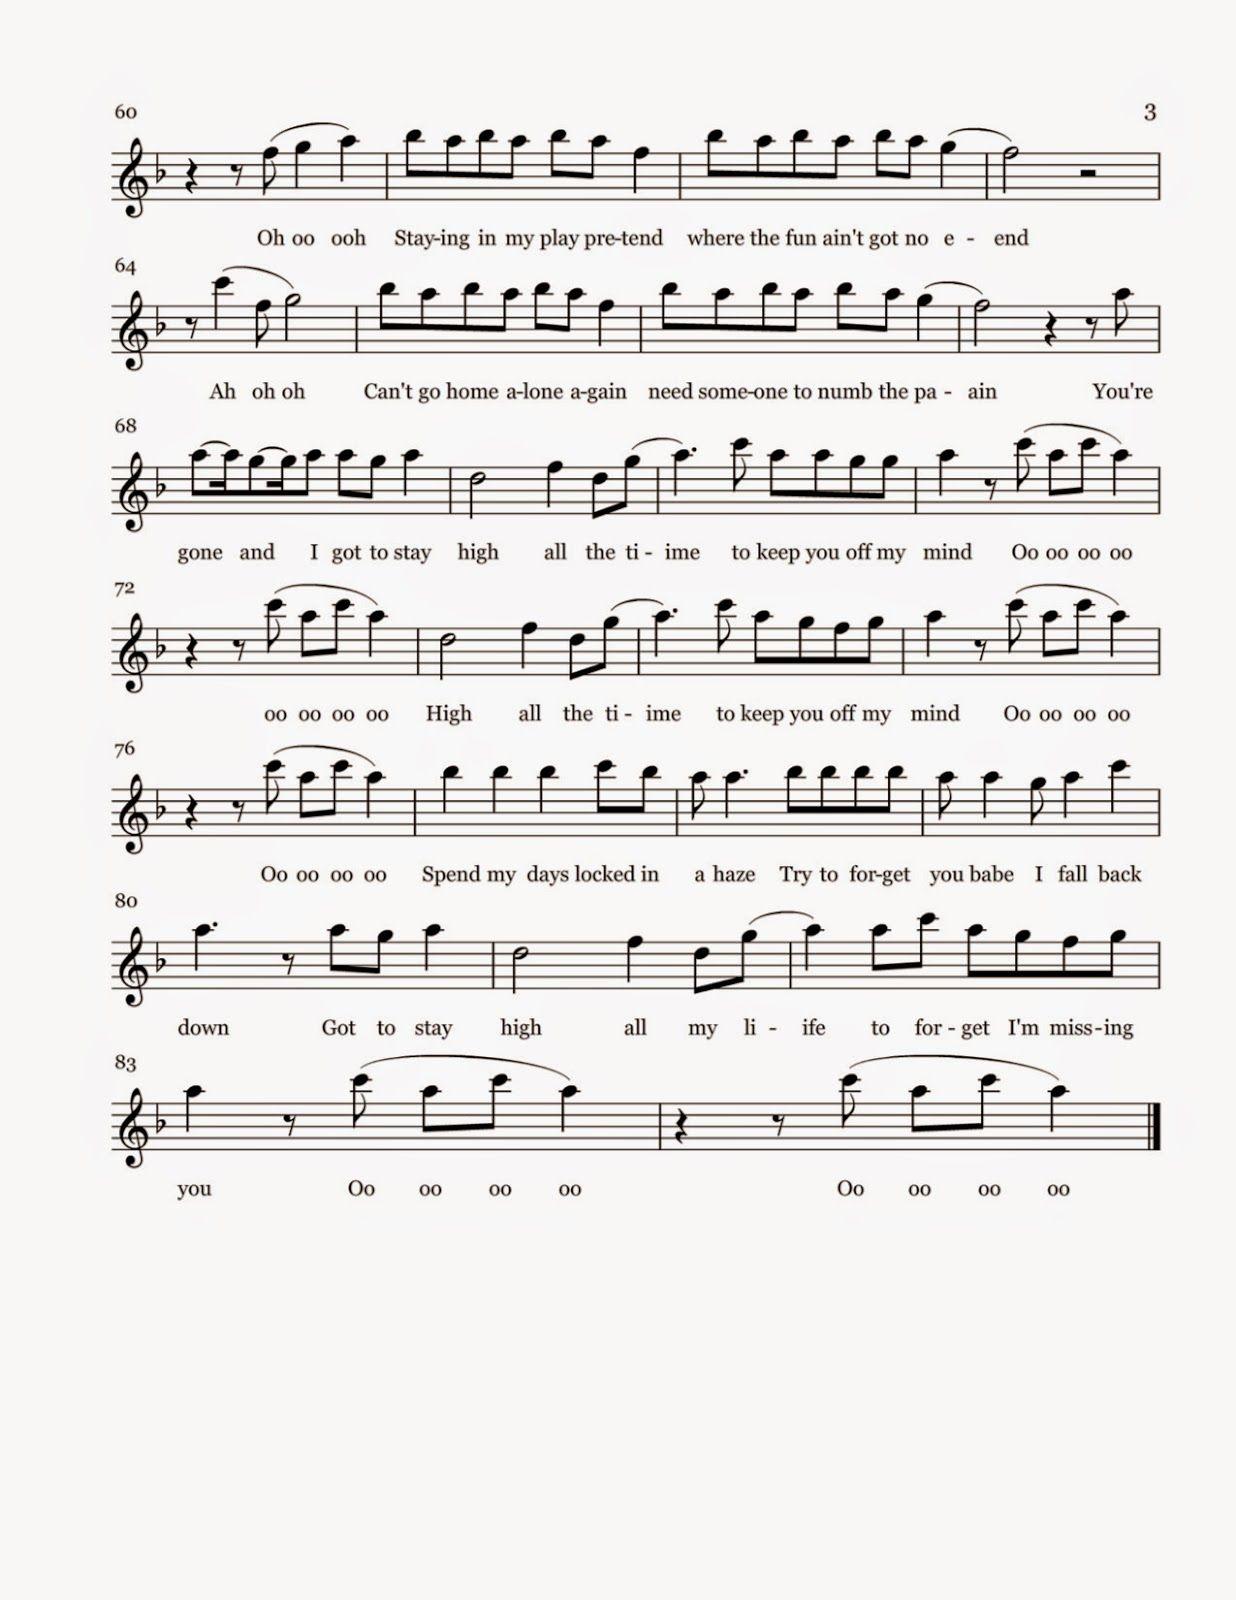 Flute sheet music habits stay high sheet music flute music sheet music hexwebz Images